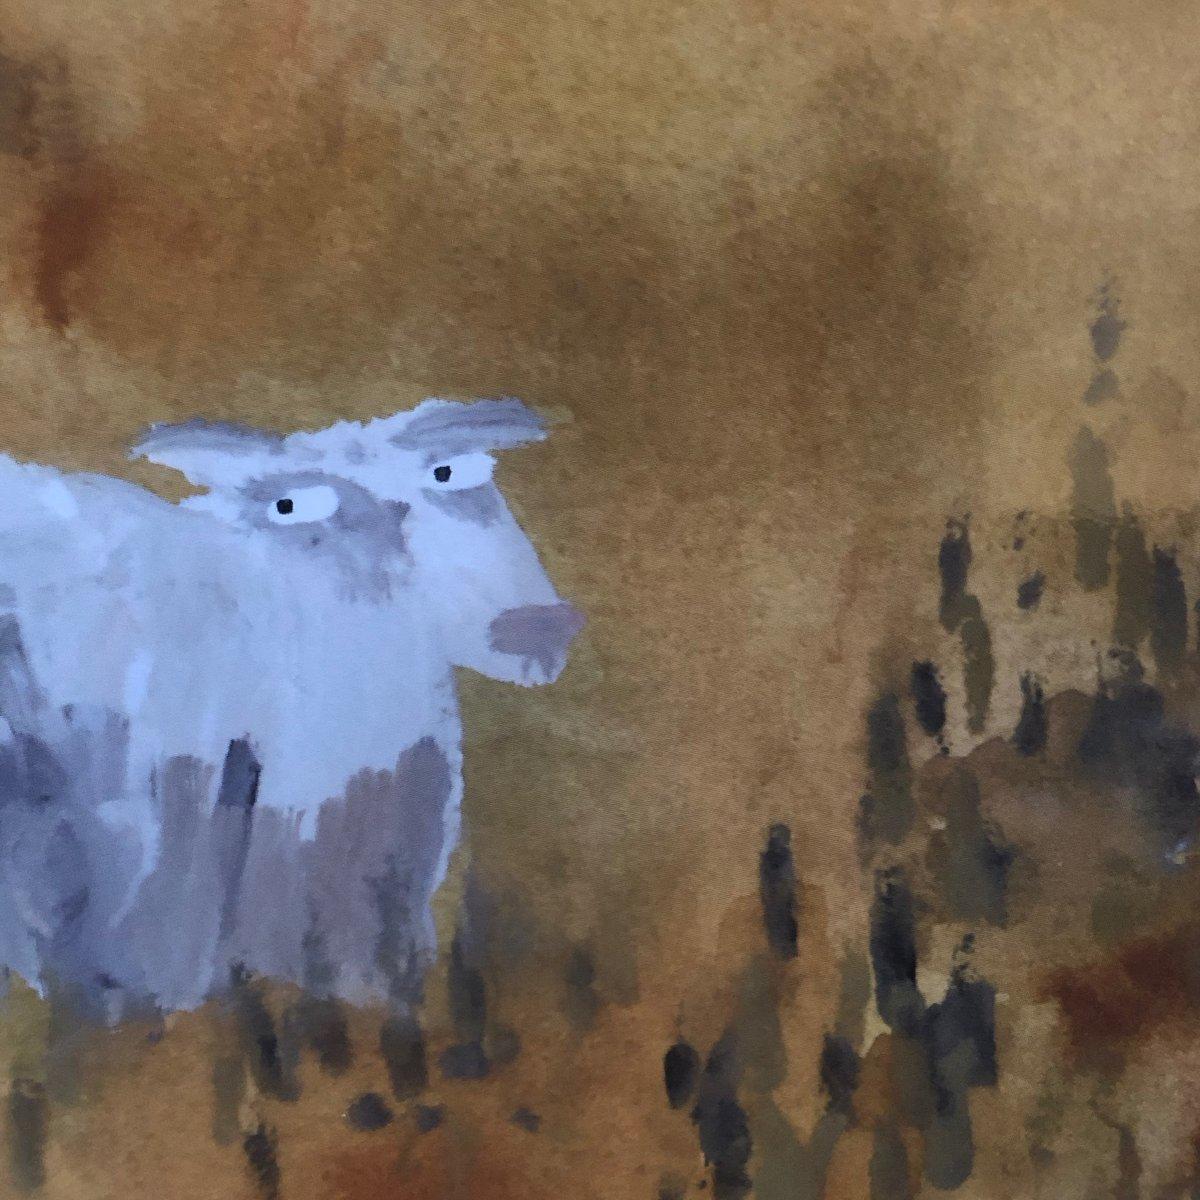 Academics guide to the worlds sluttiest animals (comic)